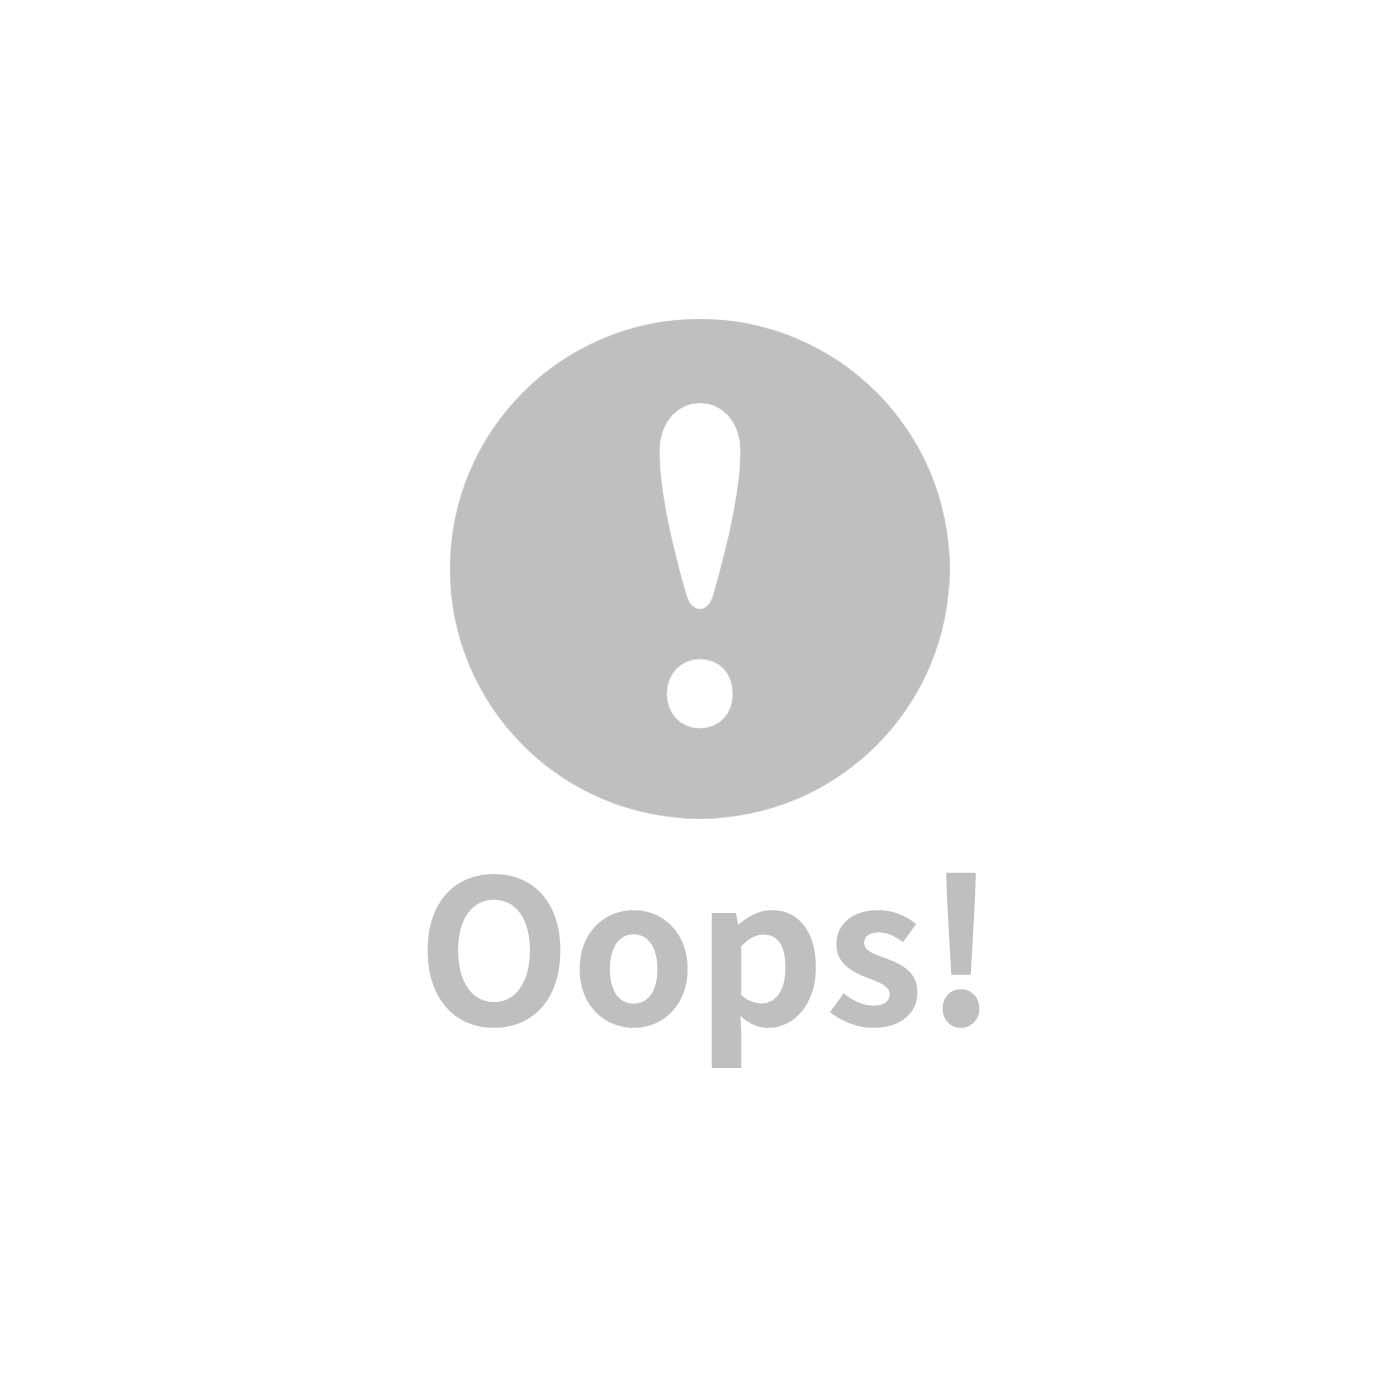 IG照與隋棠兒子MAX同款護頭型嬰兒枕-La Millou 天使枕/新生兒房扁頭嬰兒枕/固定頭型